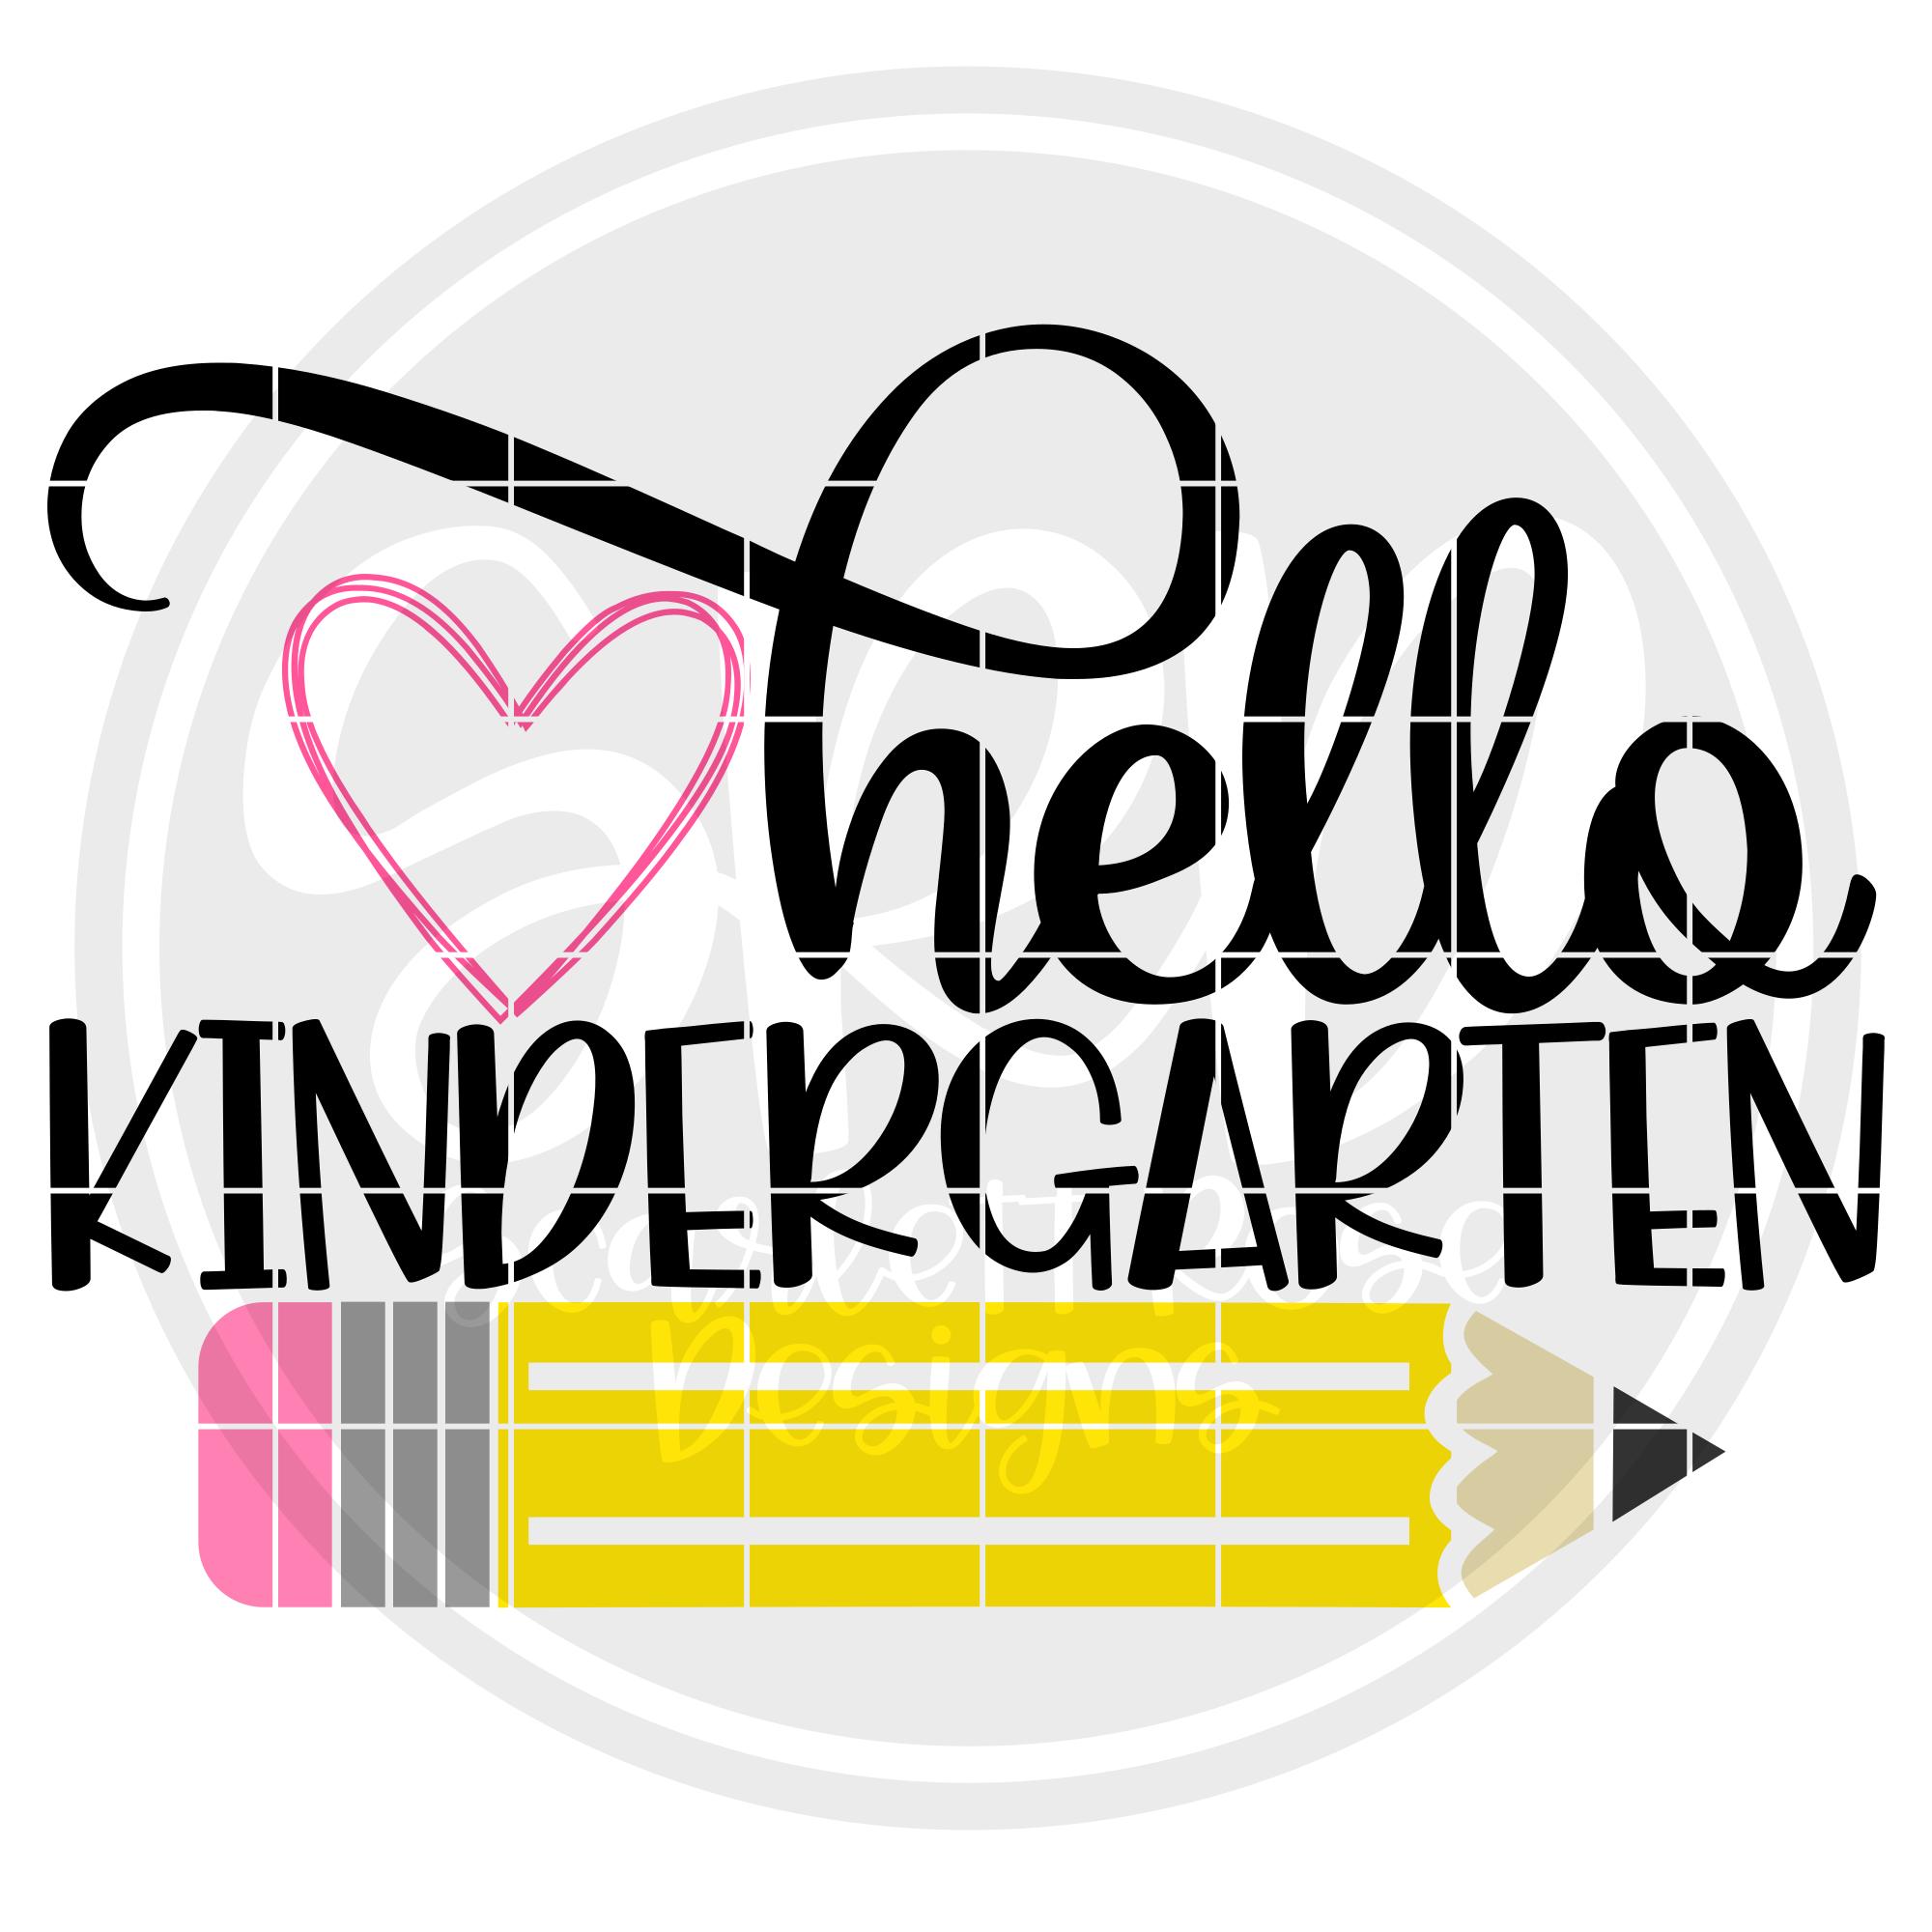 kindergarten svg #1214, Download drawings